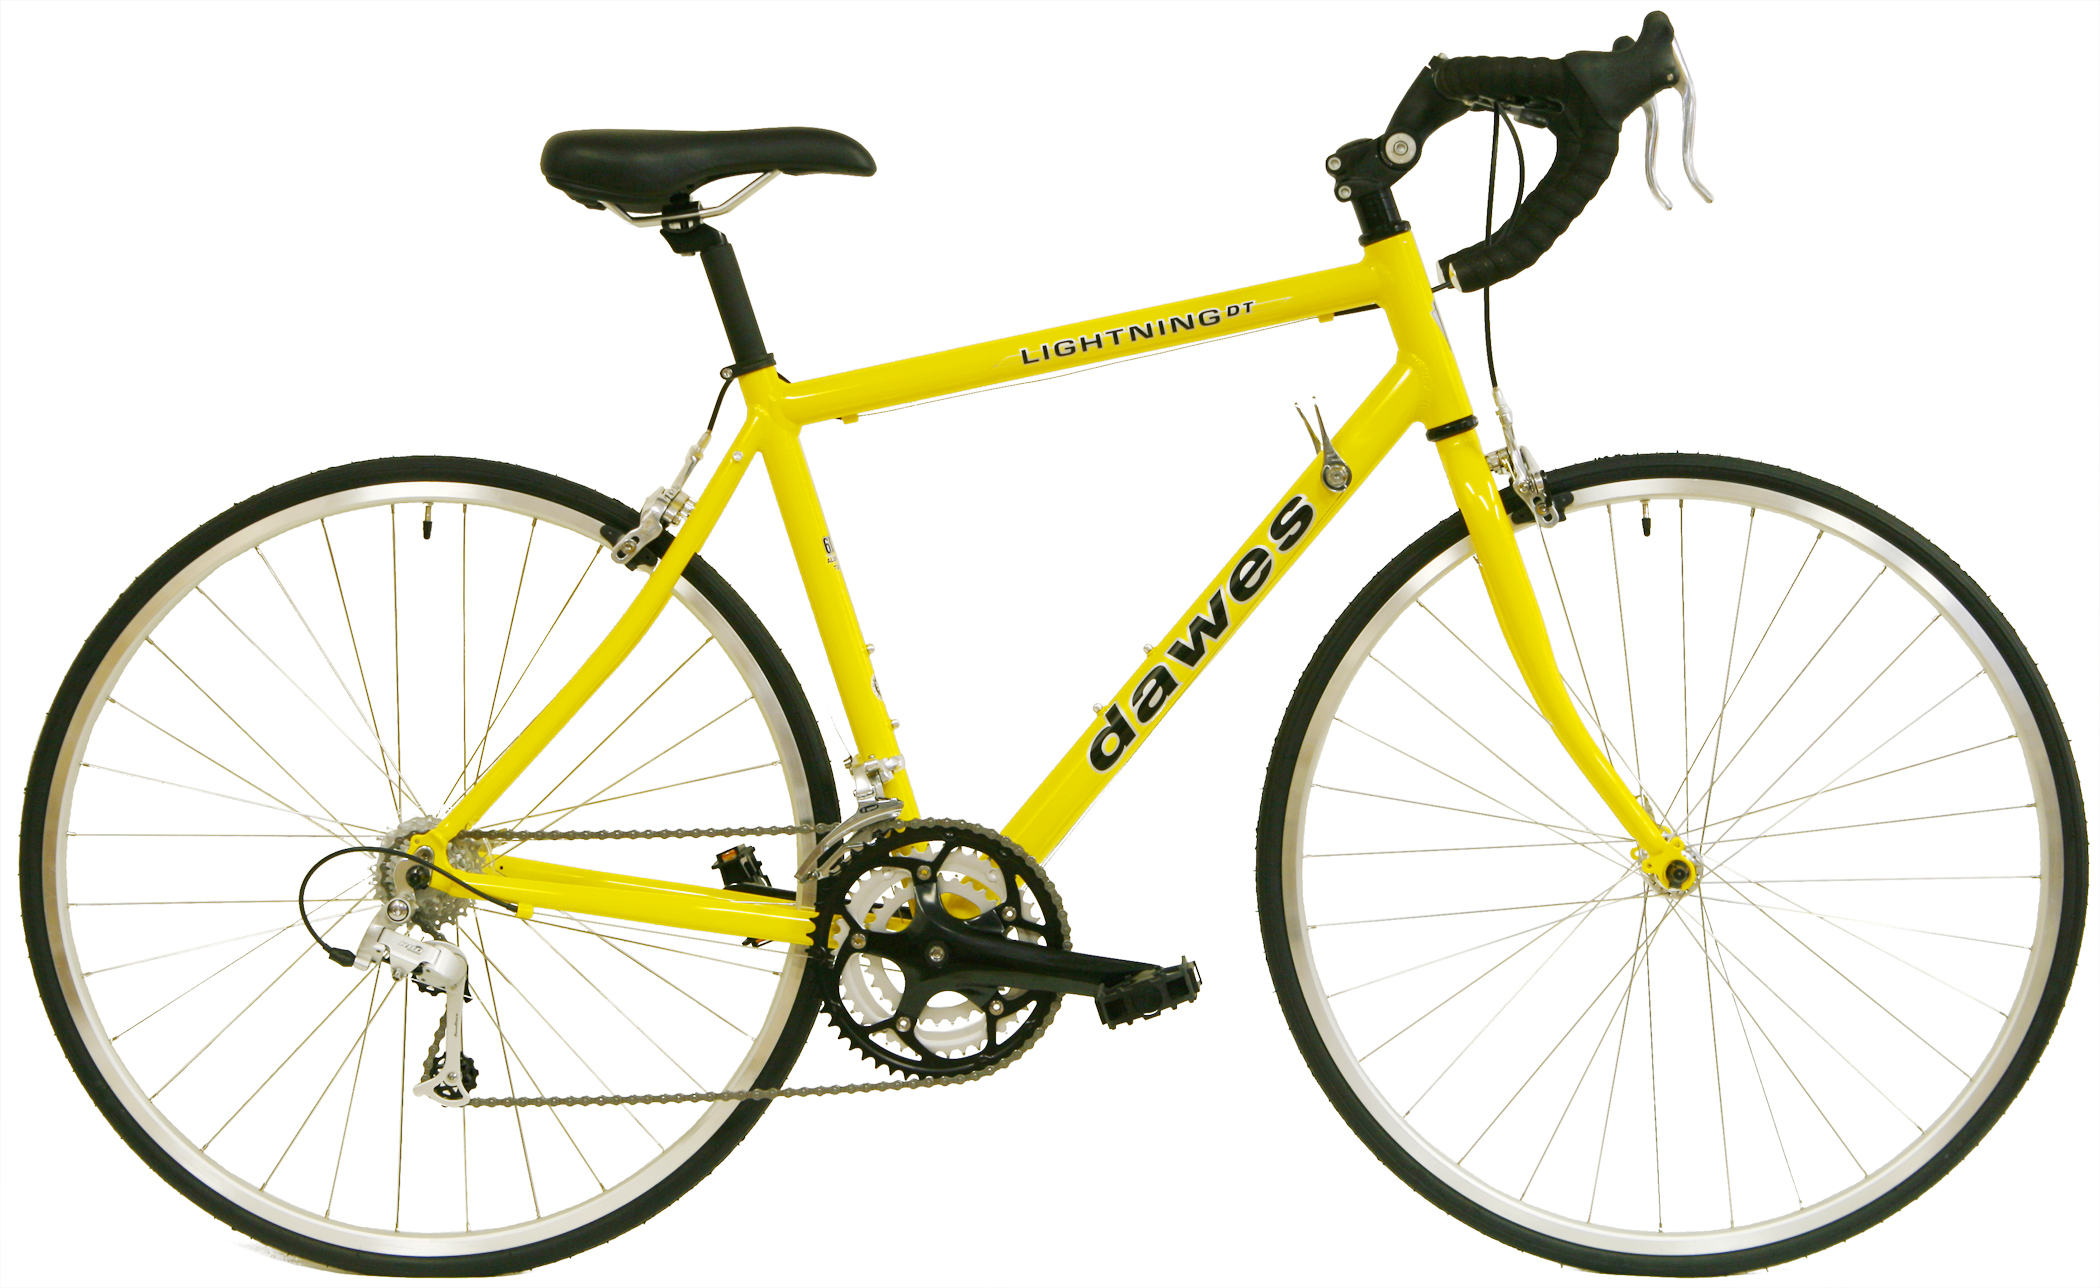 X Sold Out Dawes Lightning Dt Shimano 24sp Advanced Bicycle Lightings Aluminum Road Bike